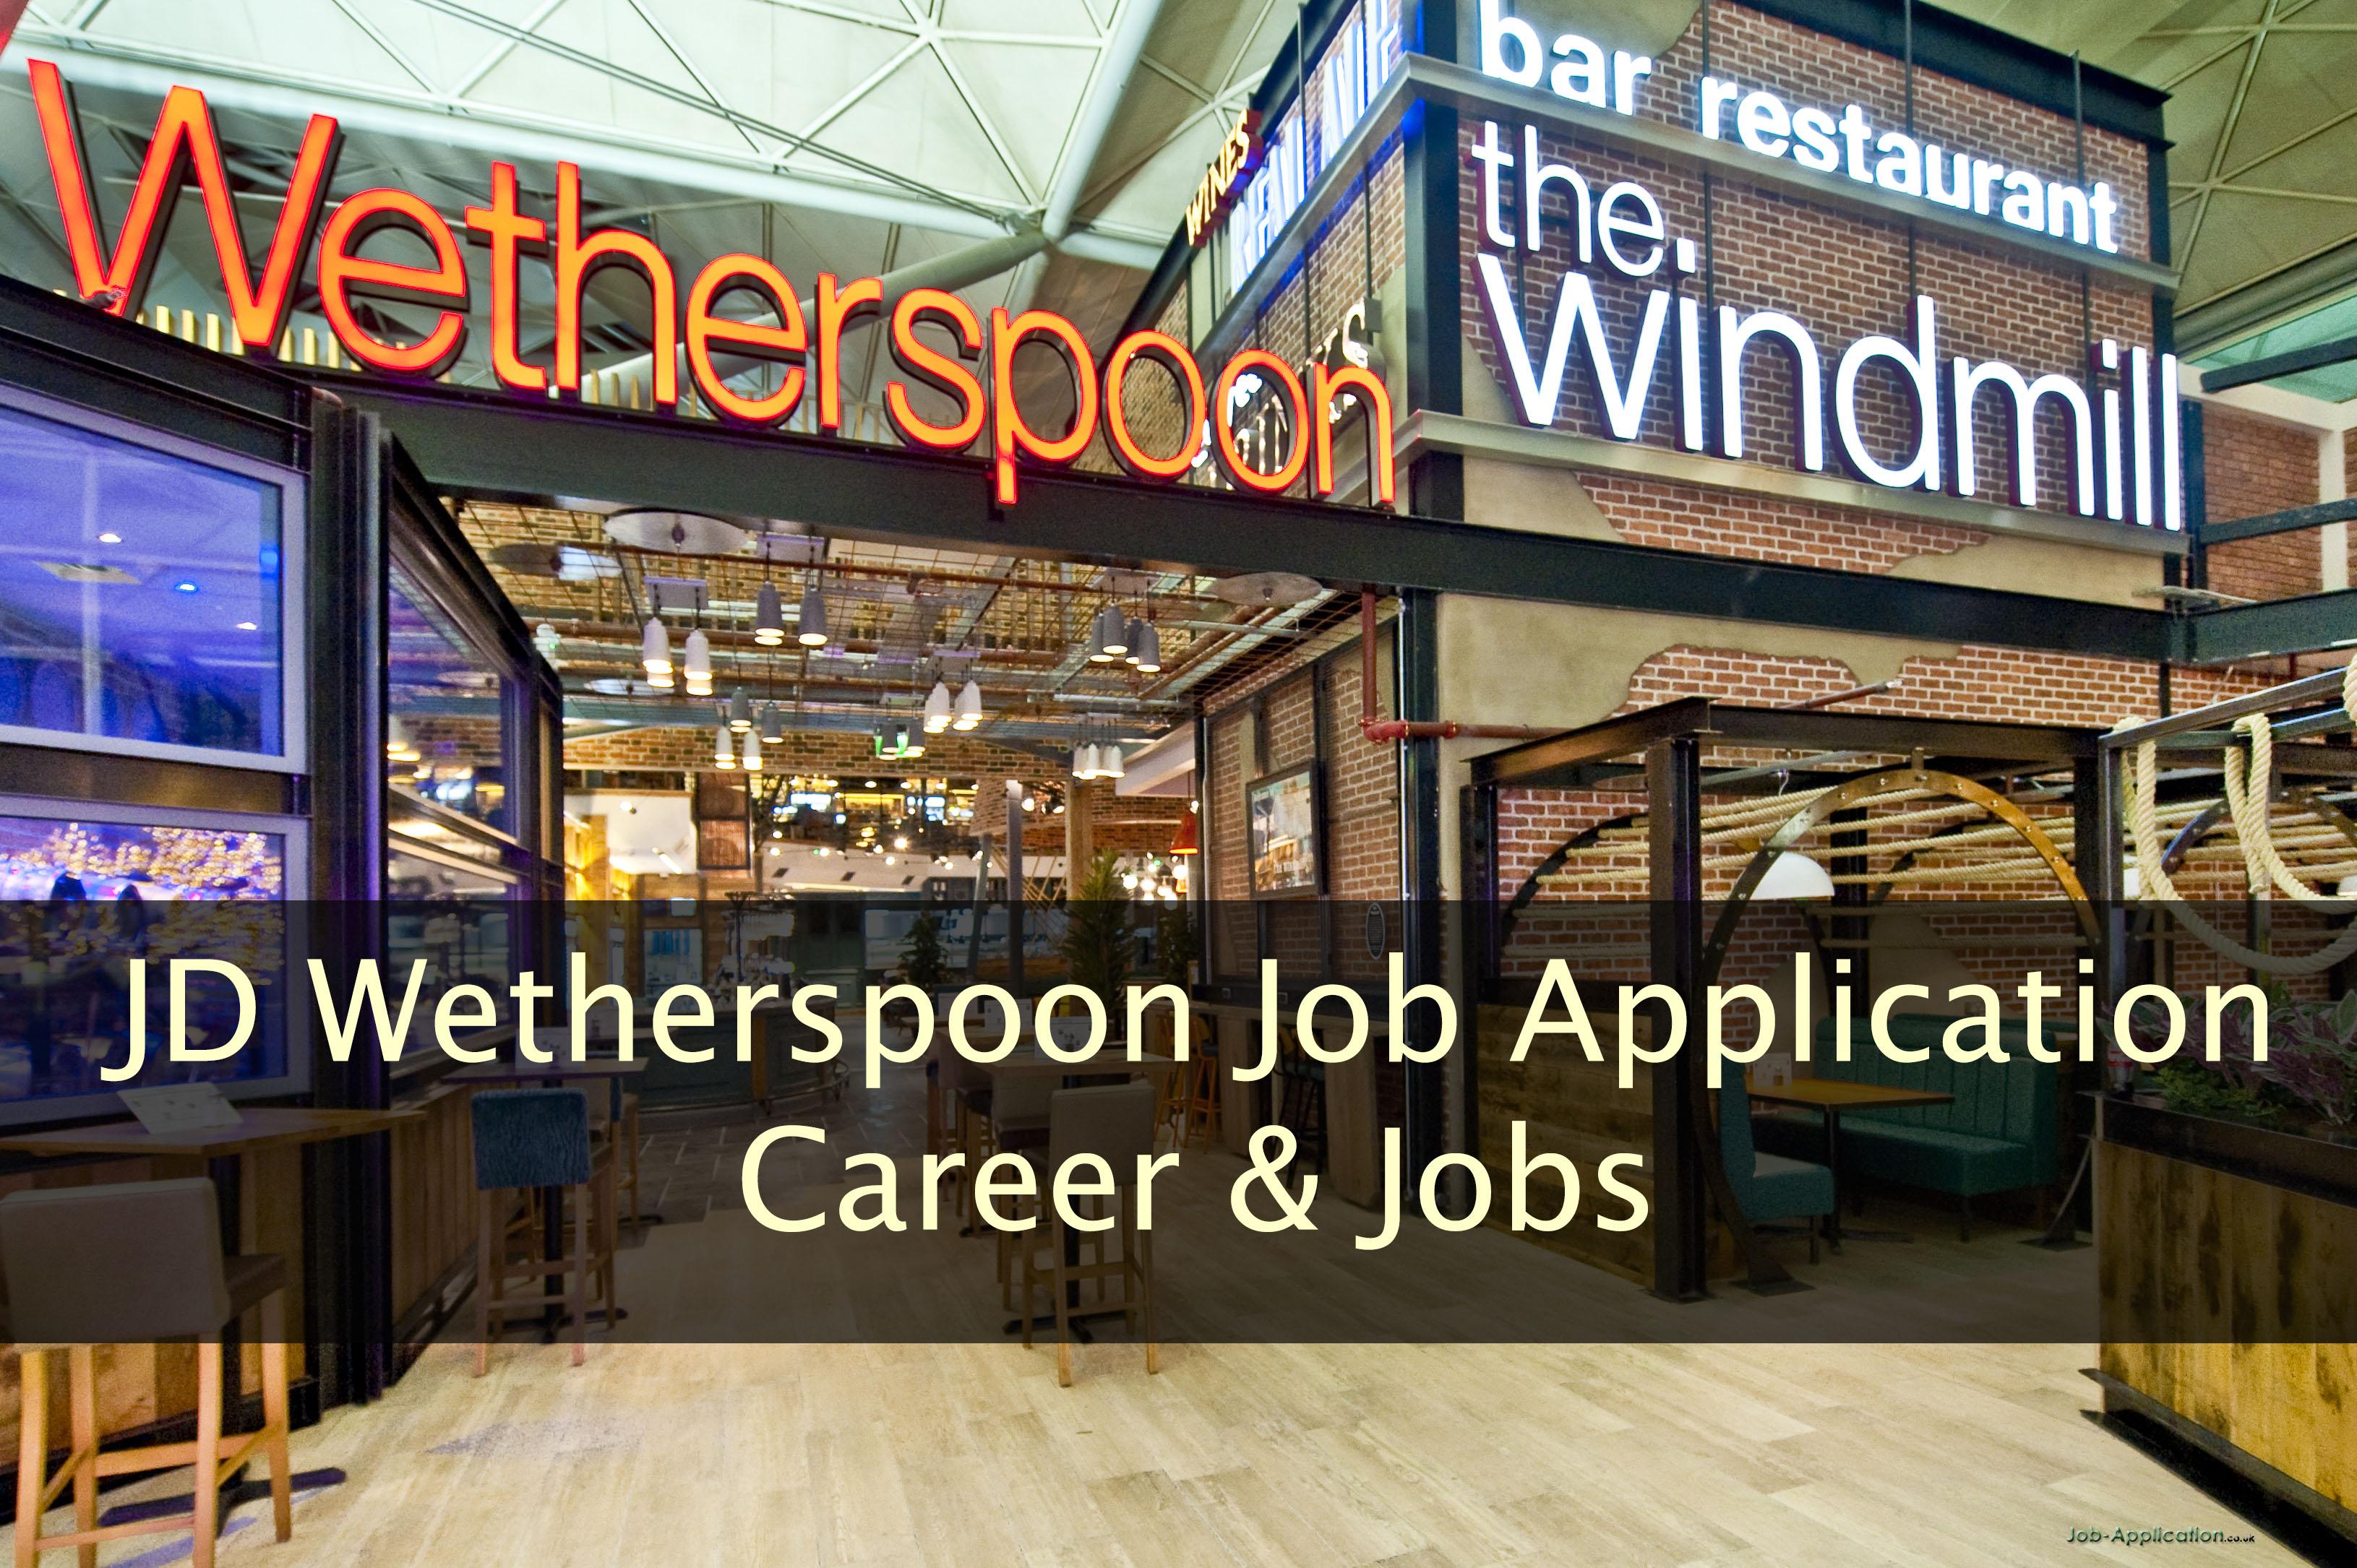 JD wetherspoon Job Application Form 2020